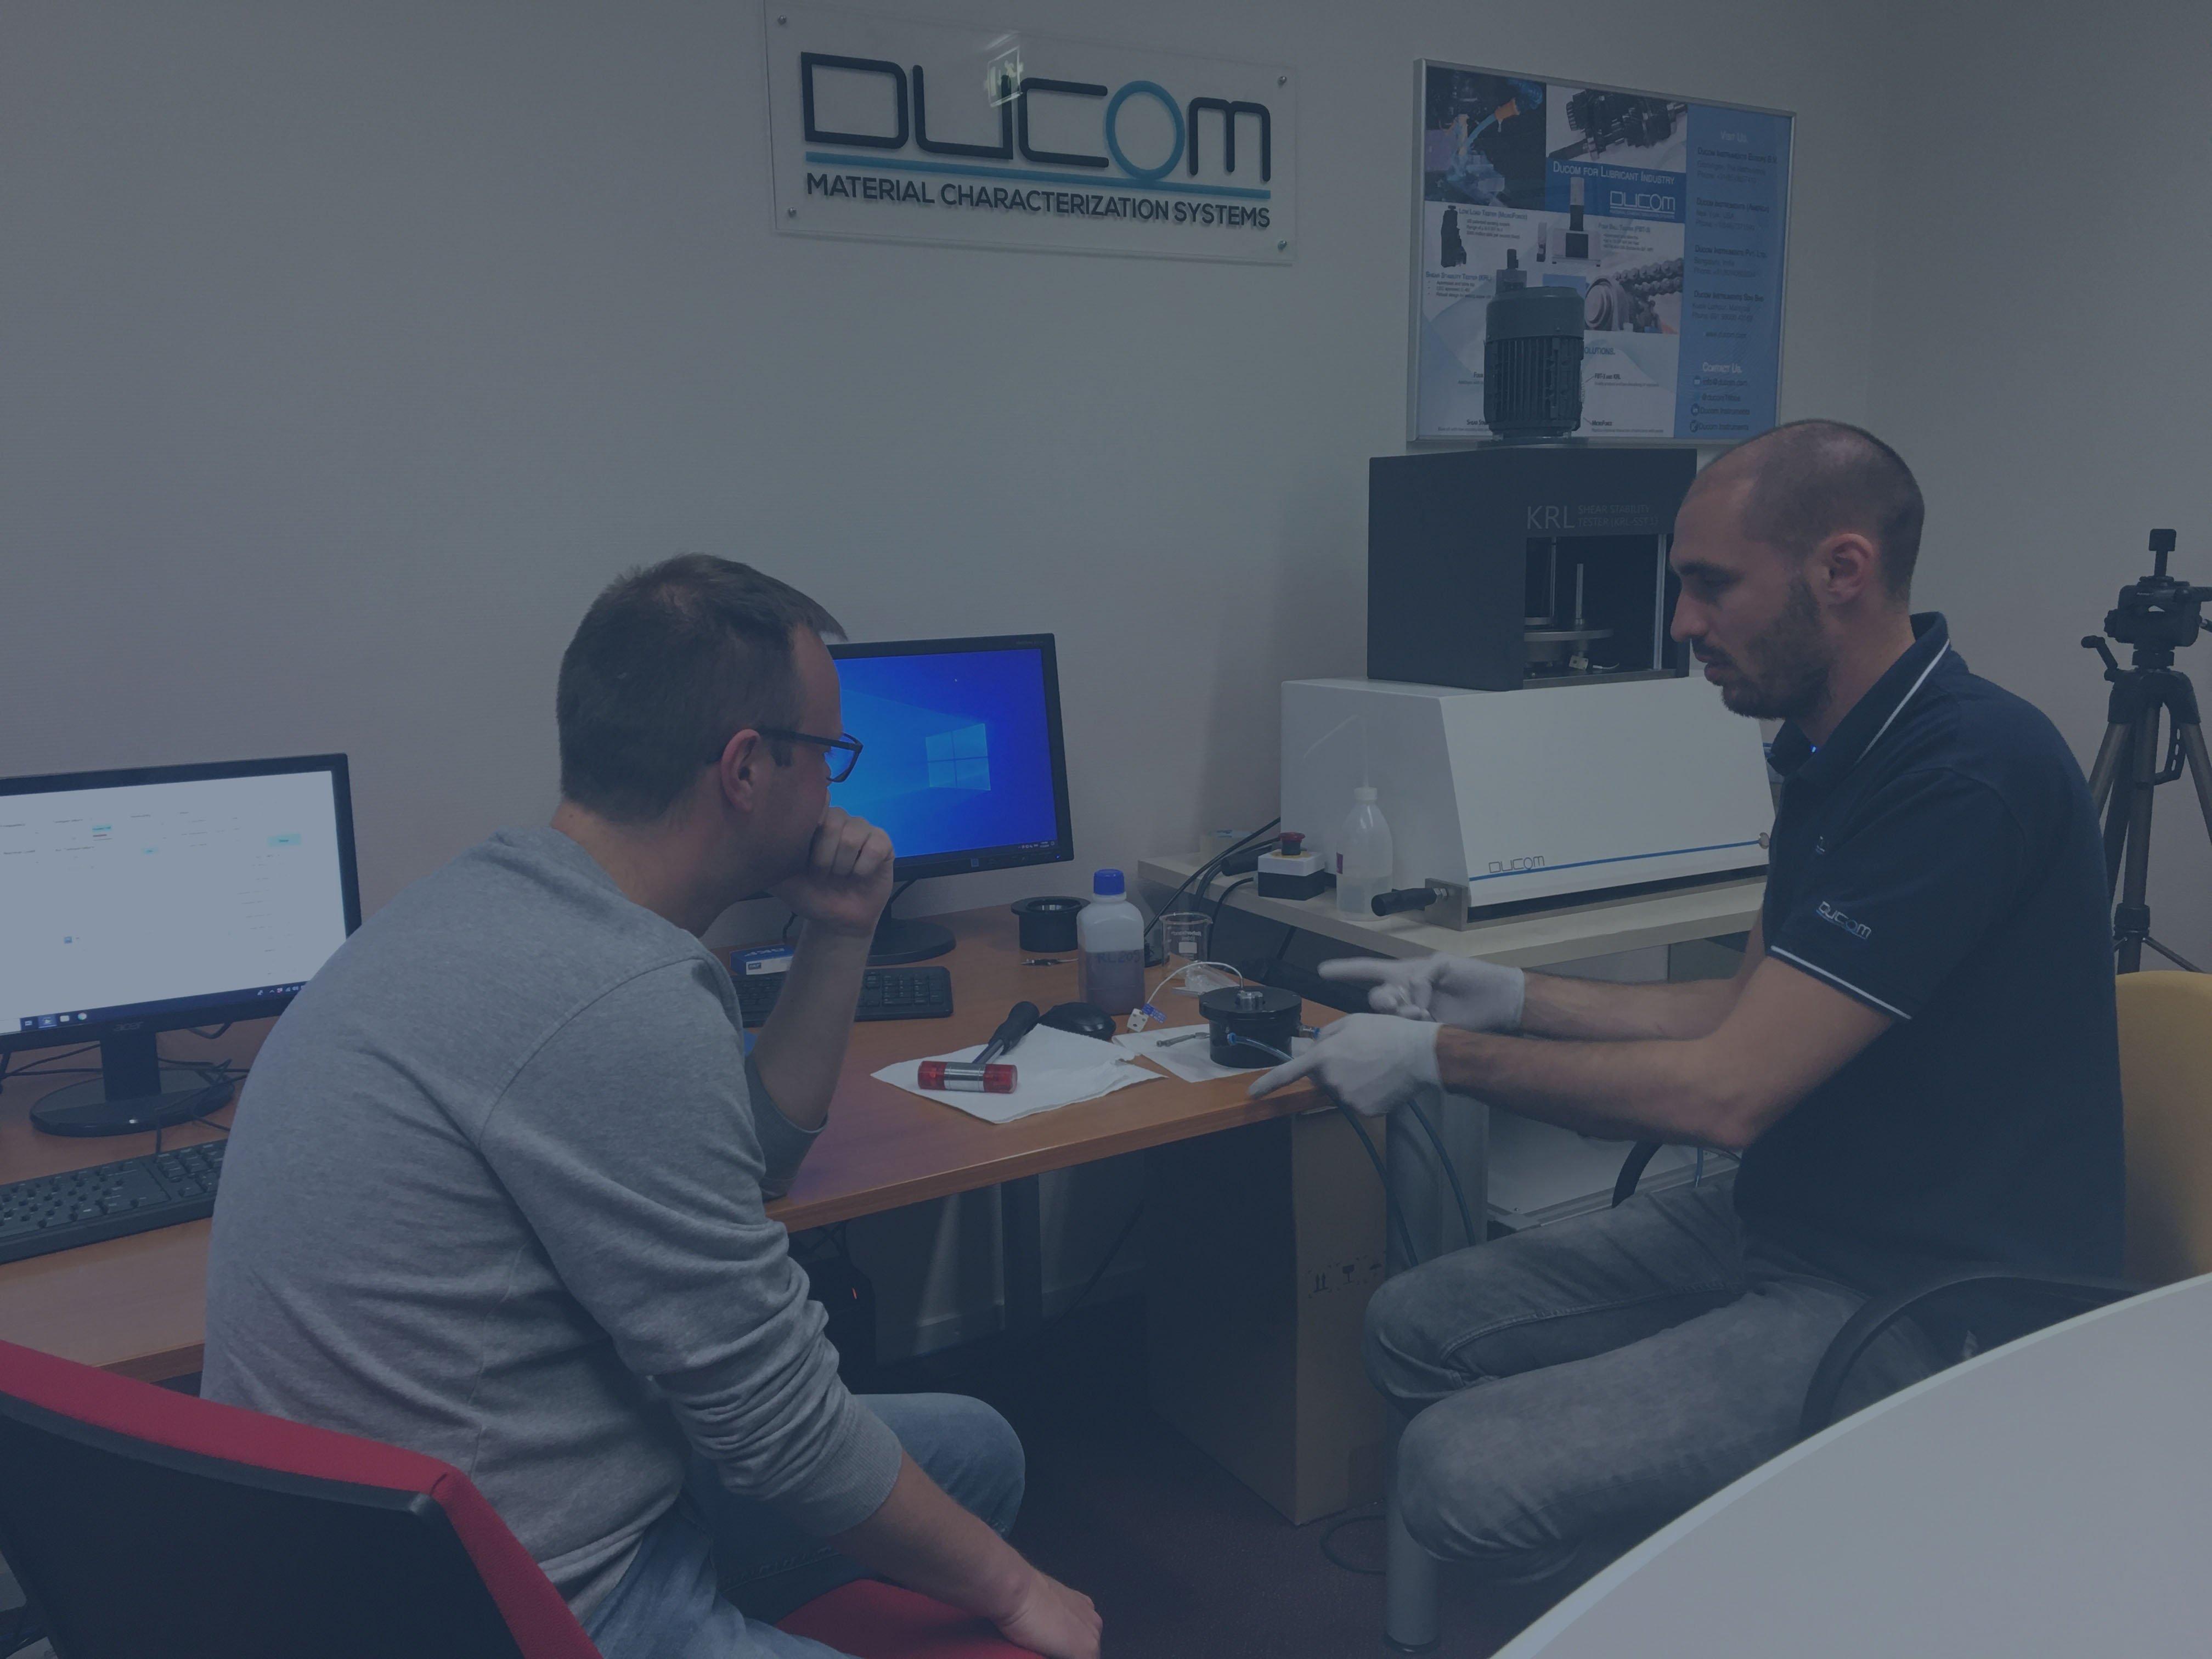 Ducom Product Training - Overlay